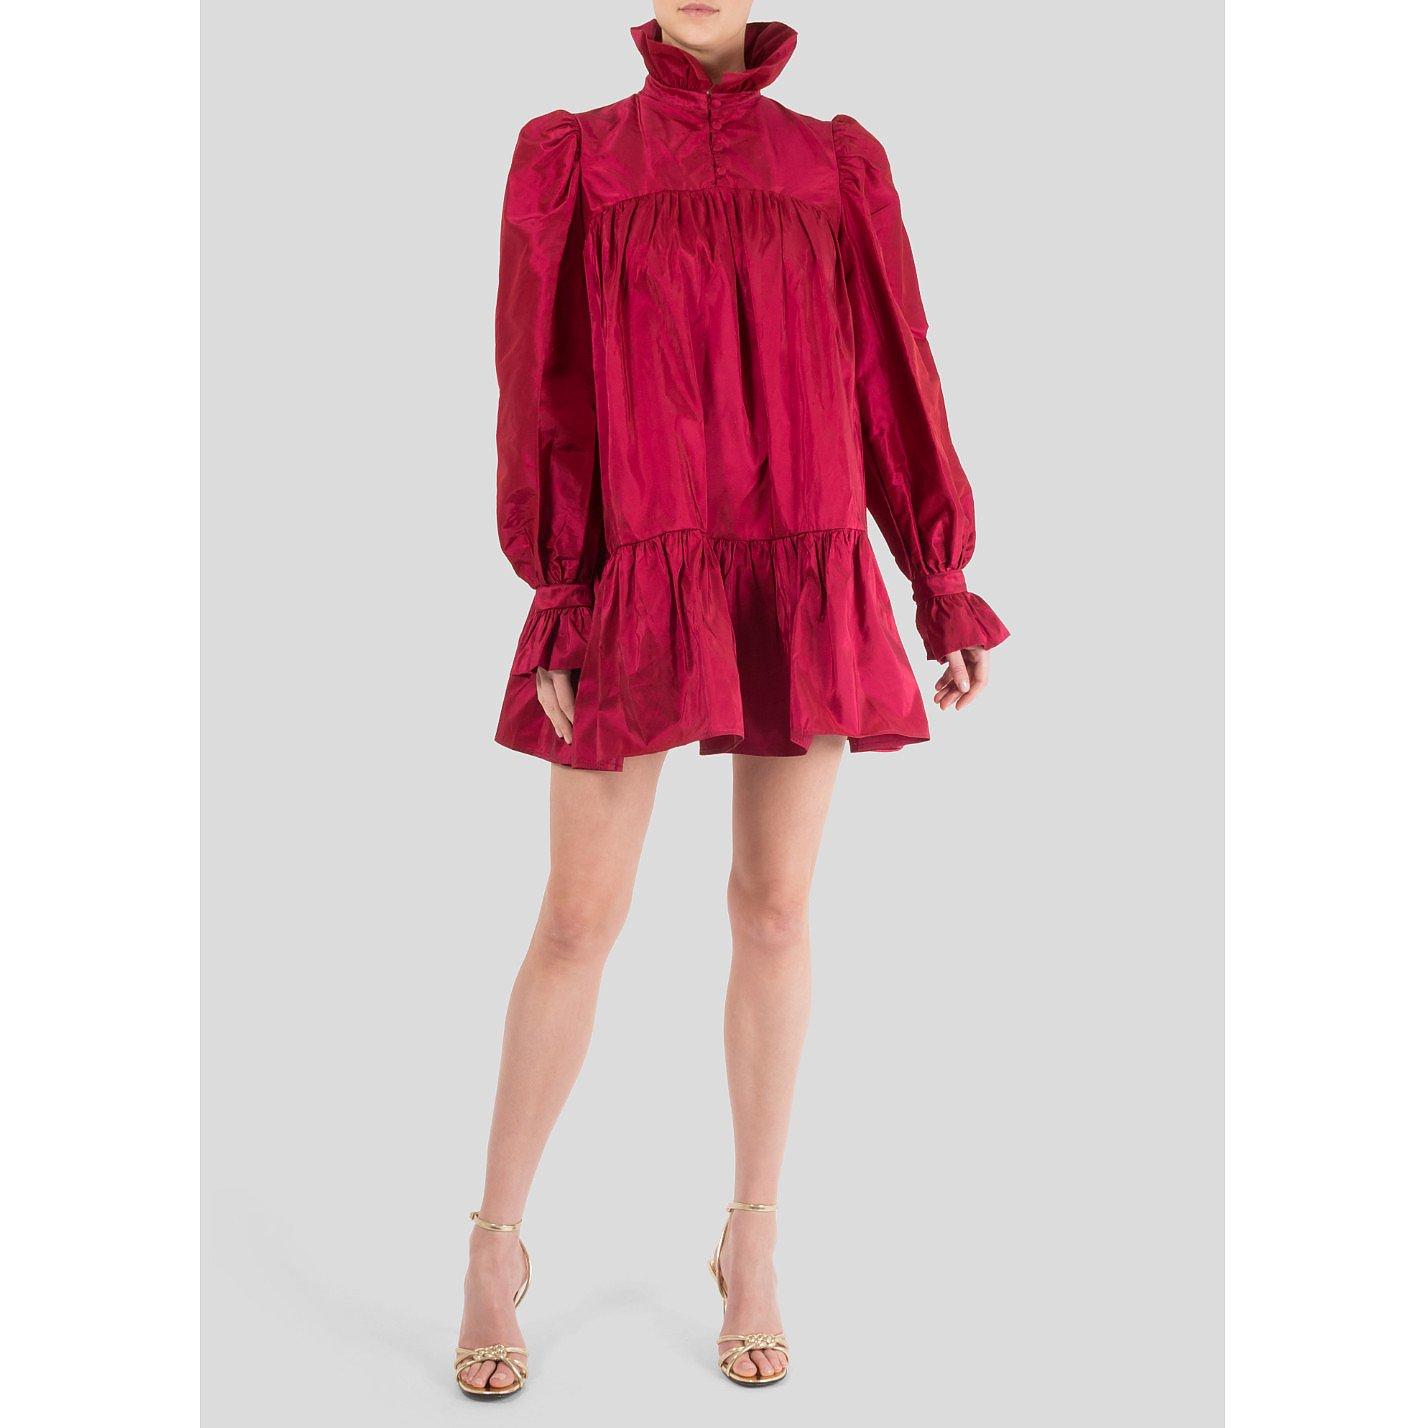 AVAVAV Ruffled Mini Dress